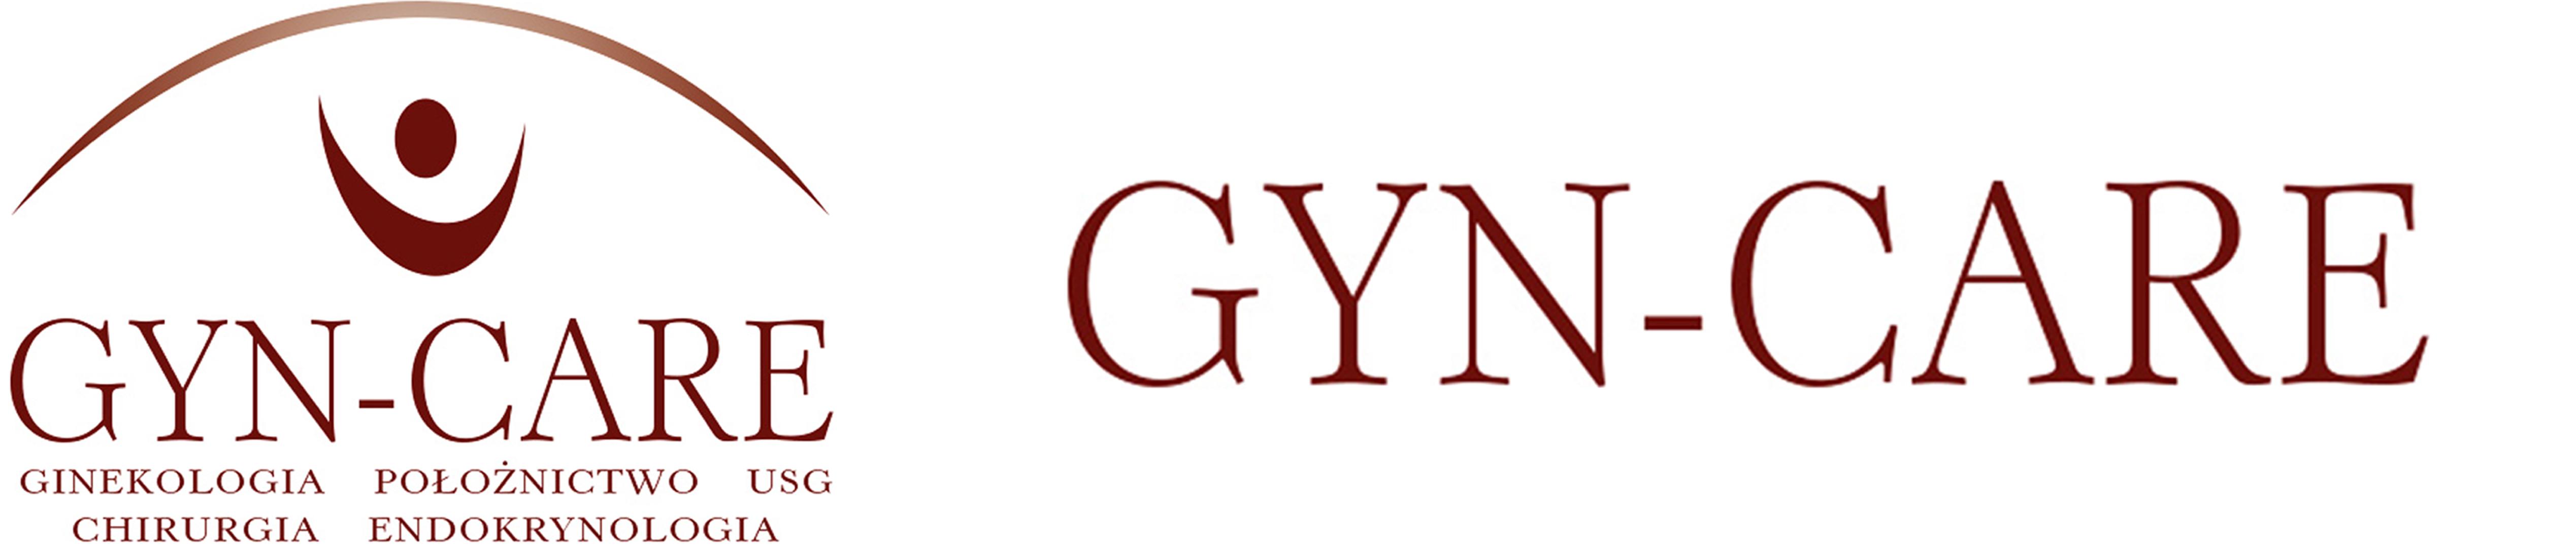 gyncare.pl